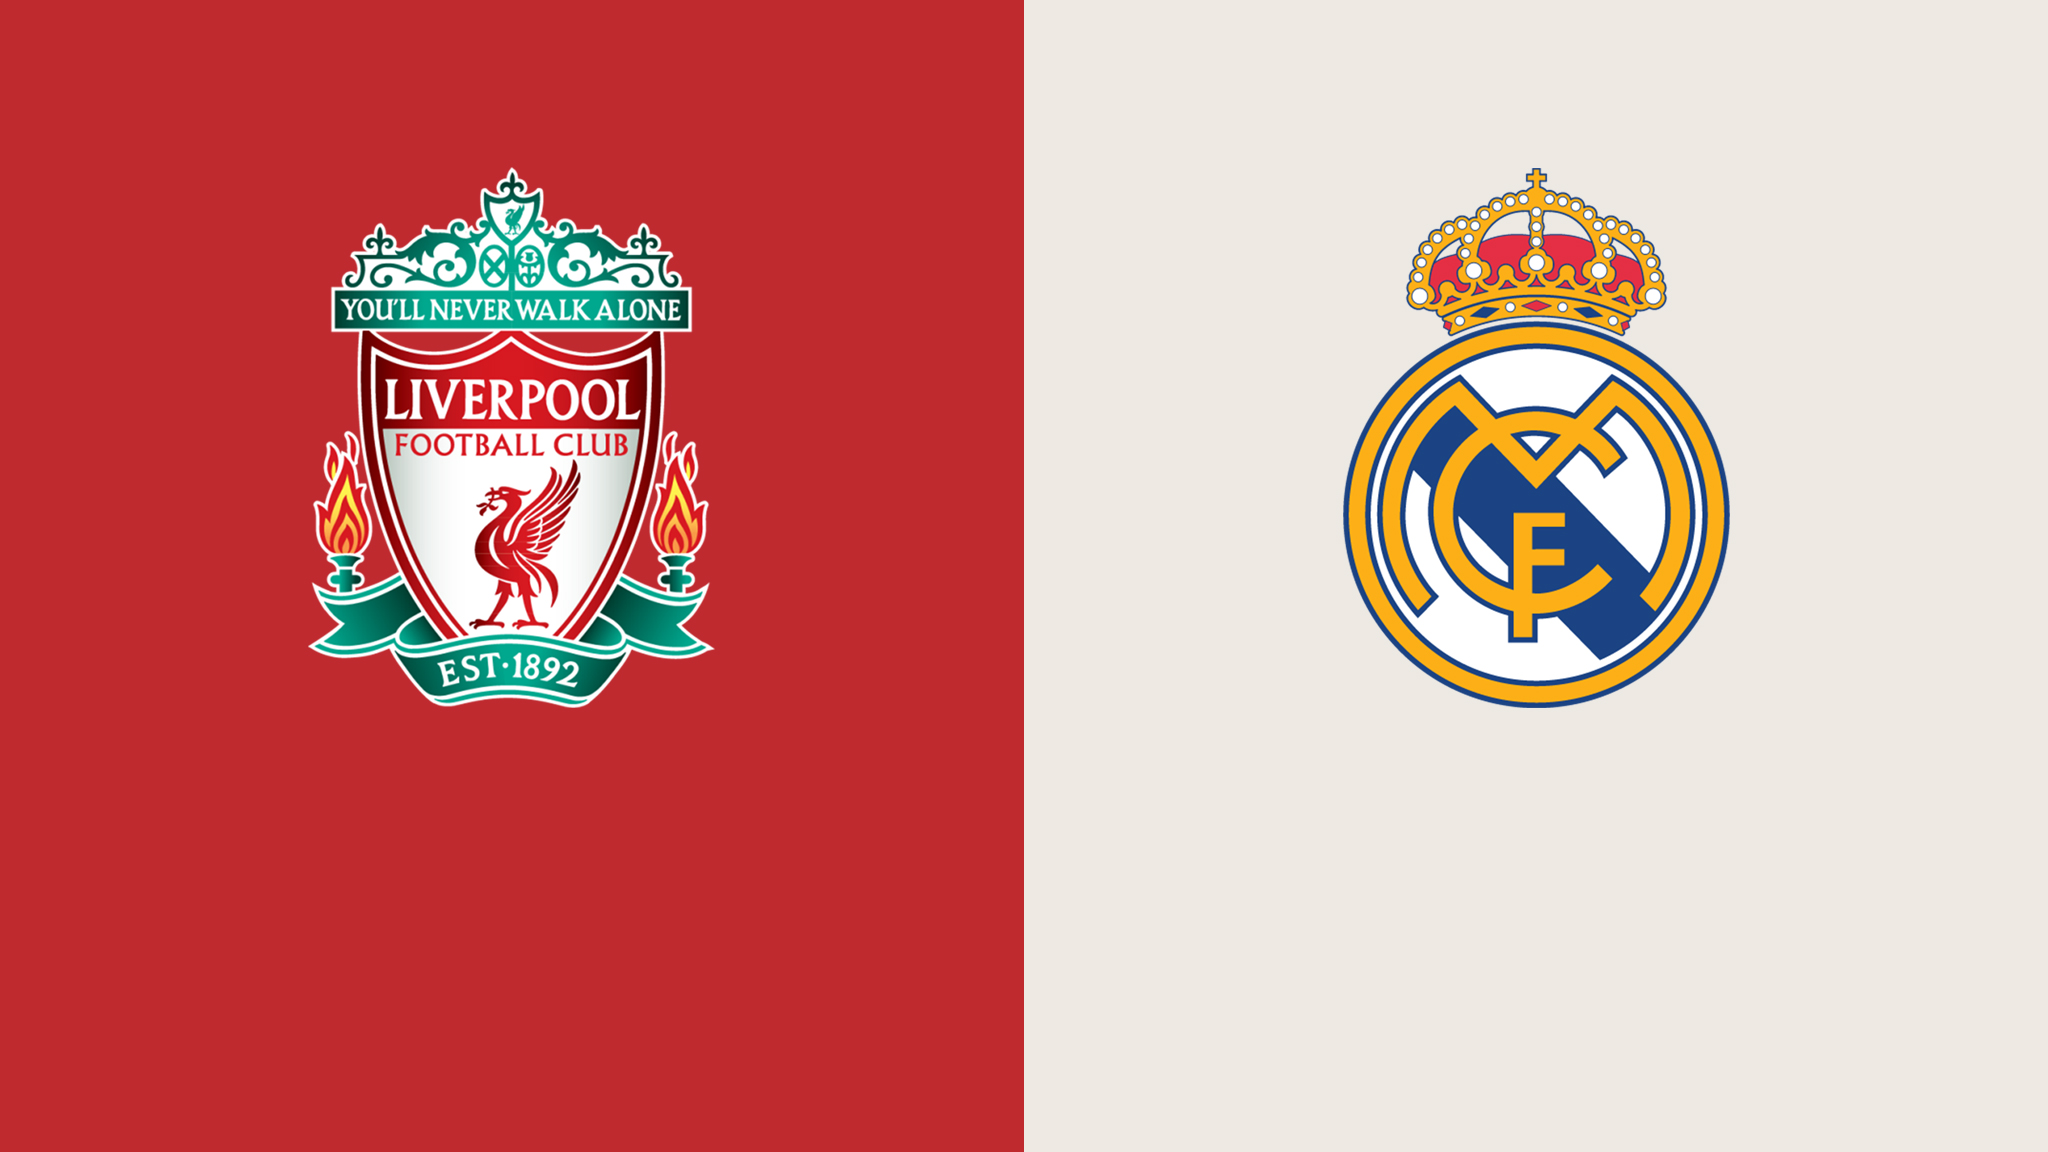 Liverpool vs Real Madrid live